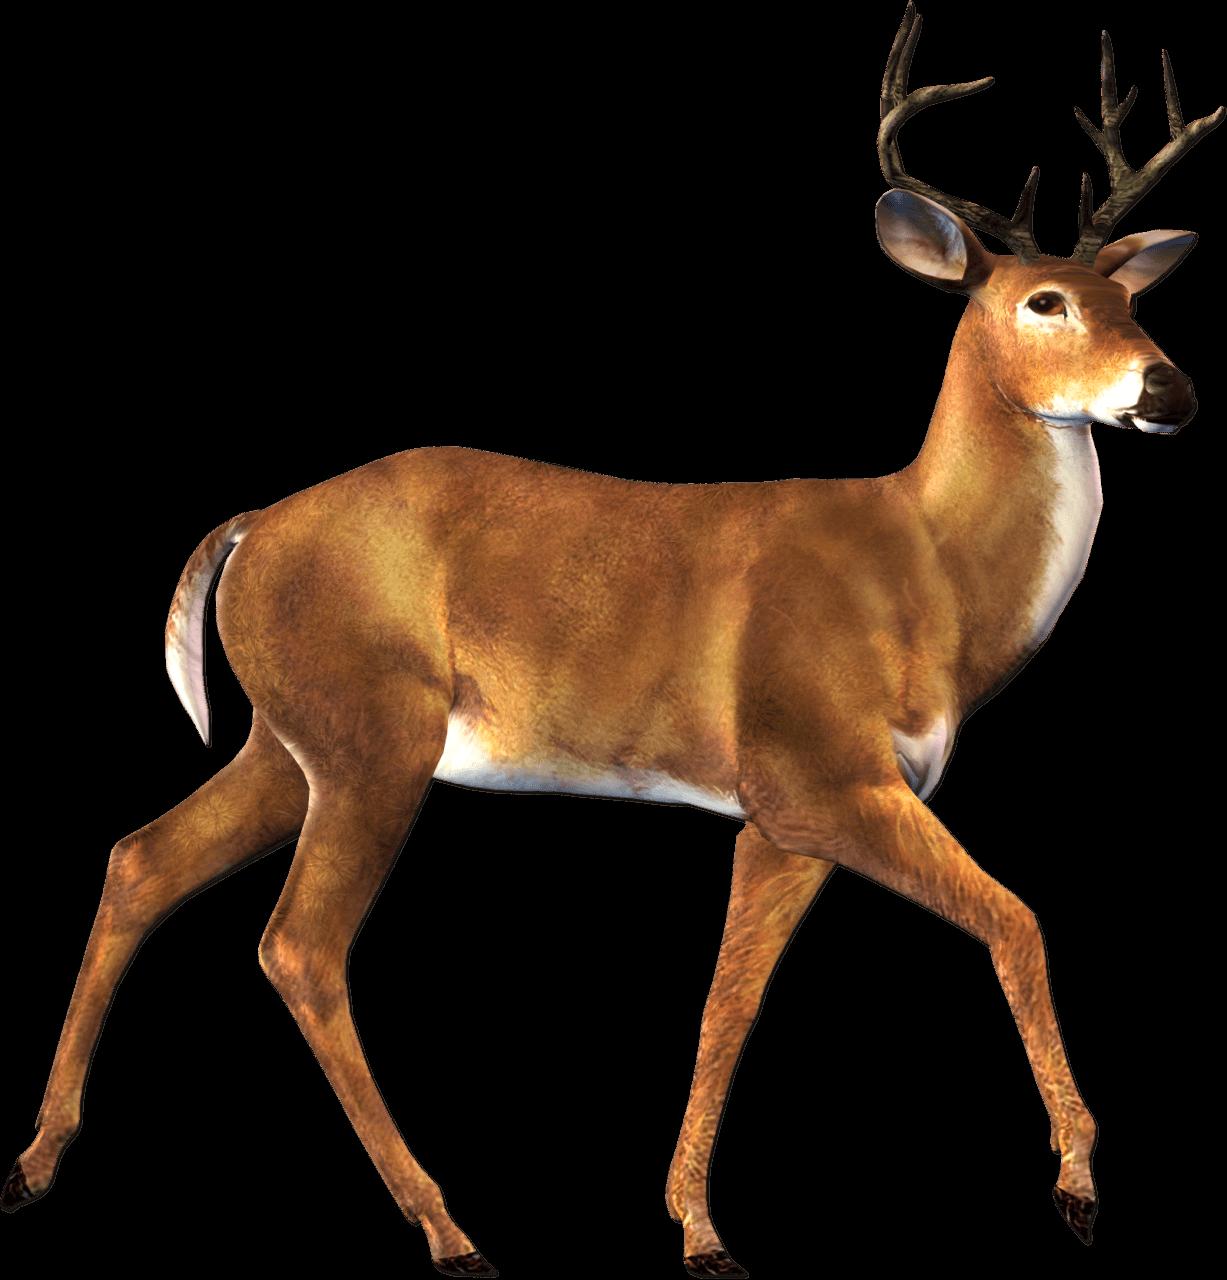 Reindeer christmas transparent png. Deer clipart real deer